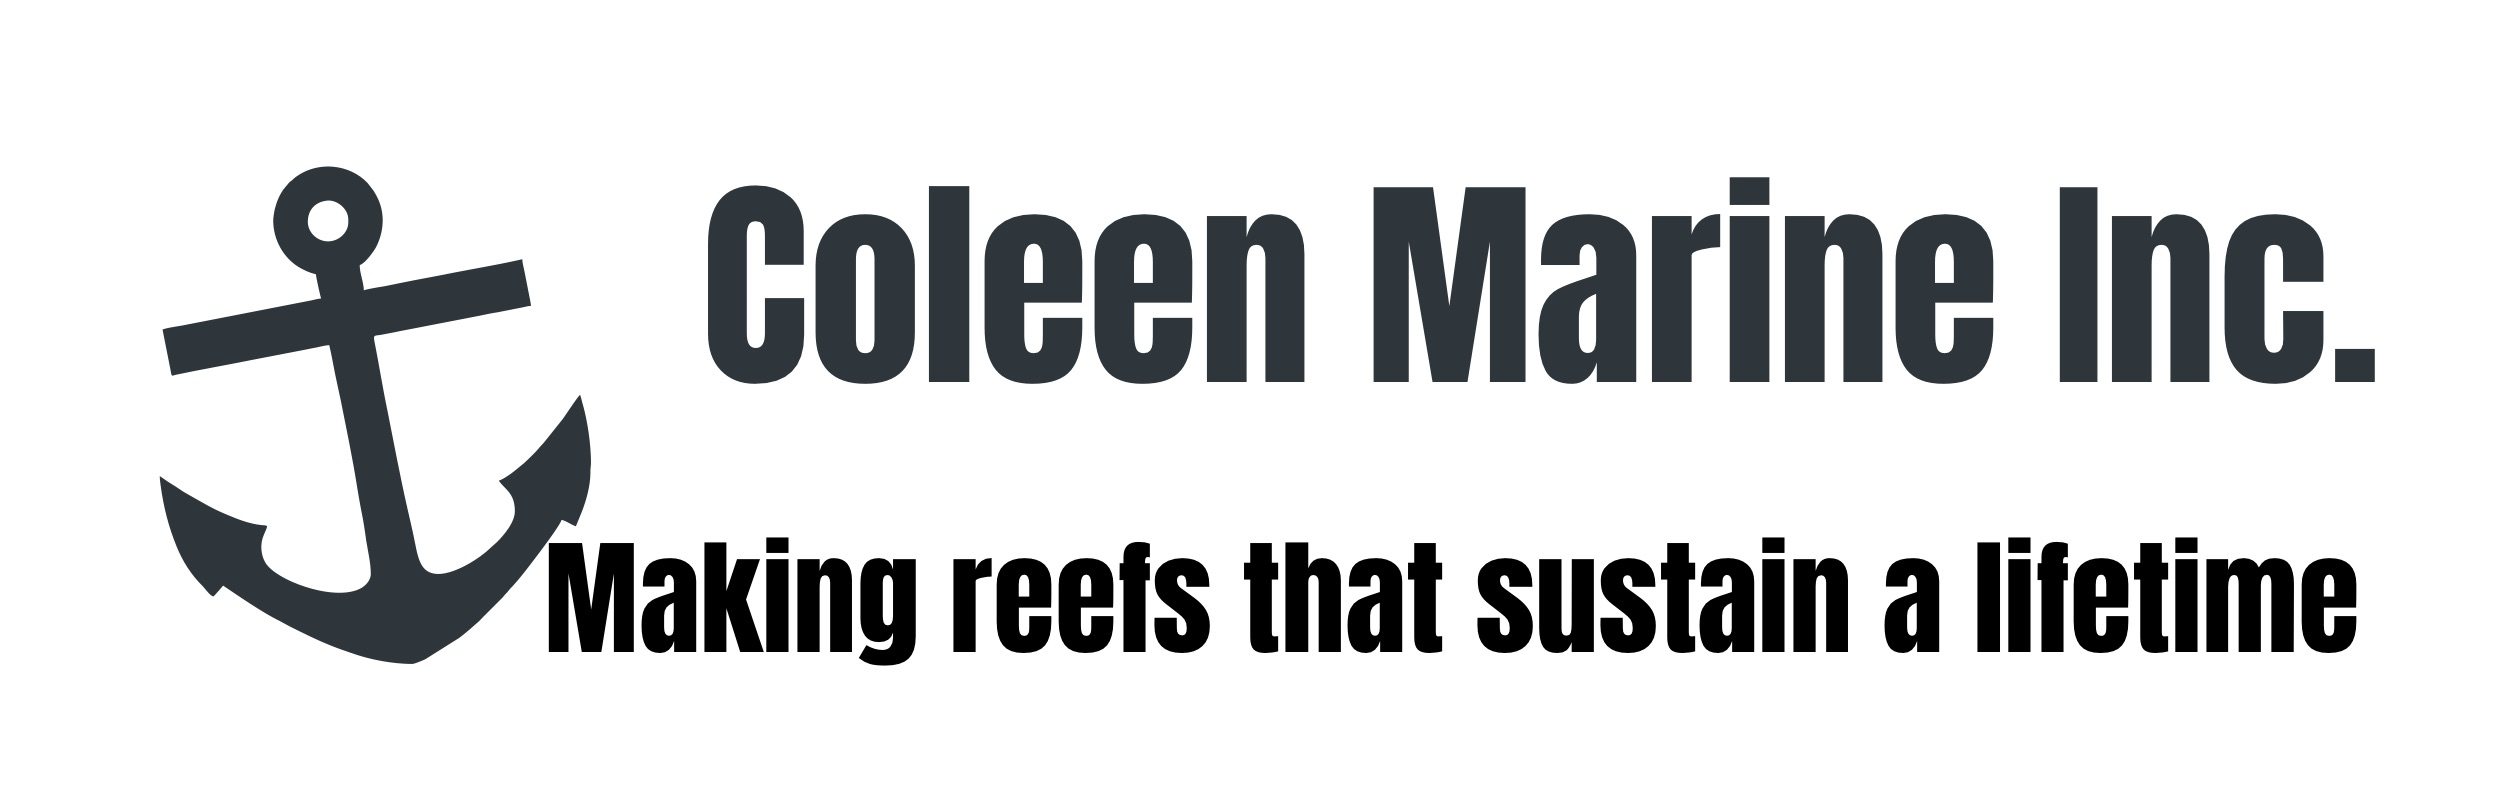 Coleen Marine Inc